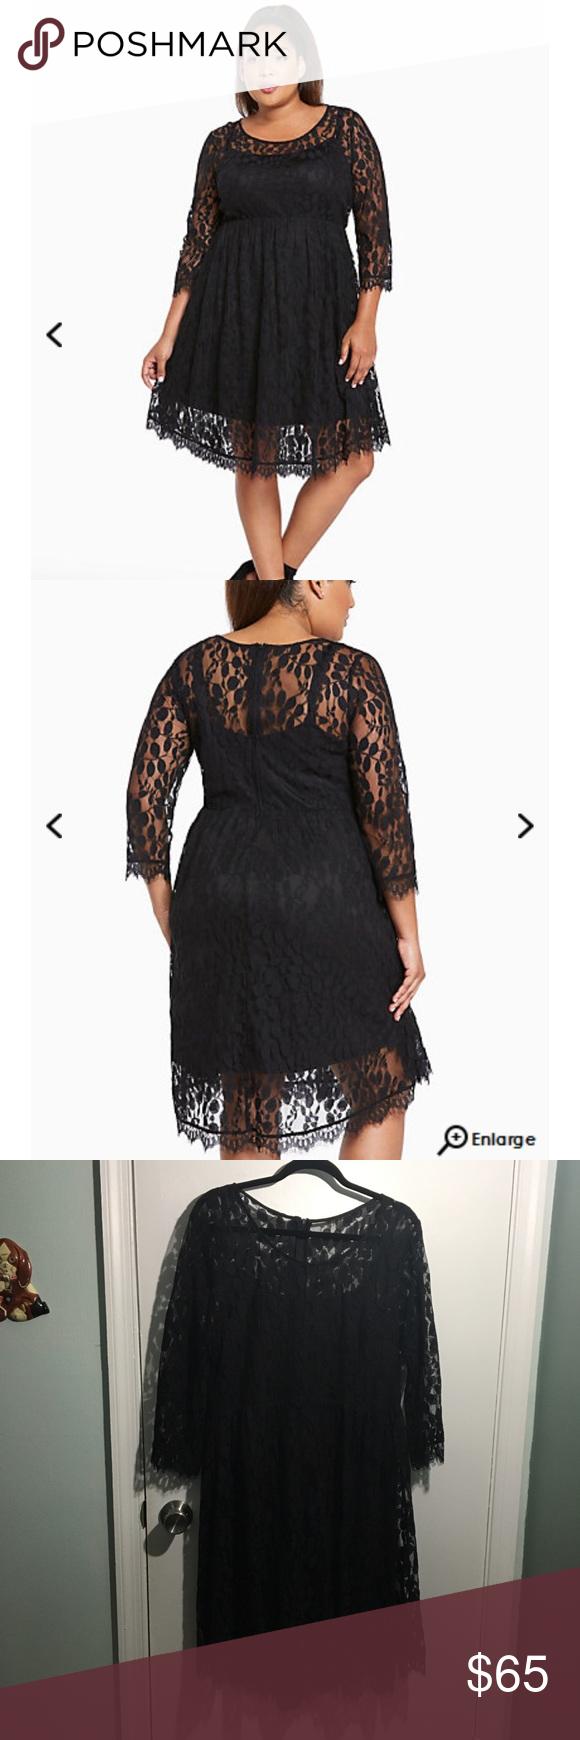 Lace dress torrid  NWOT Torrid Lace Skater Dress  Torrid